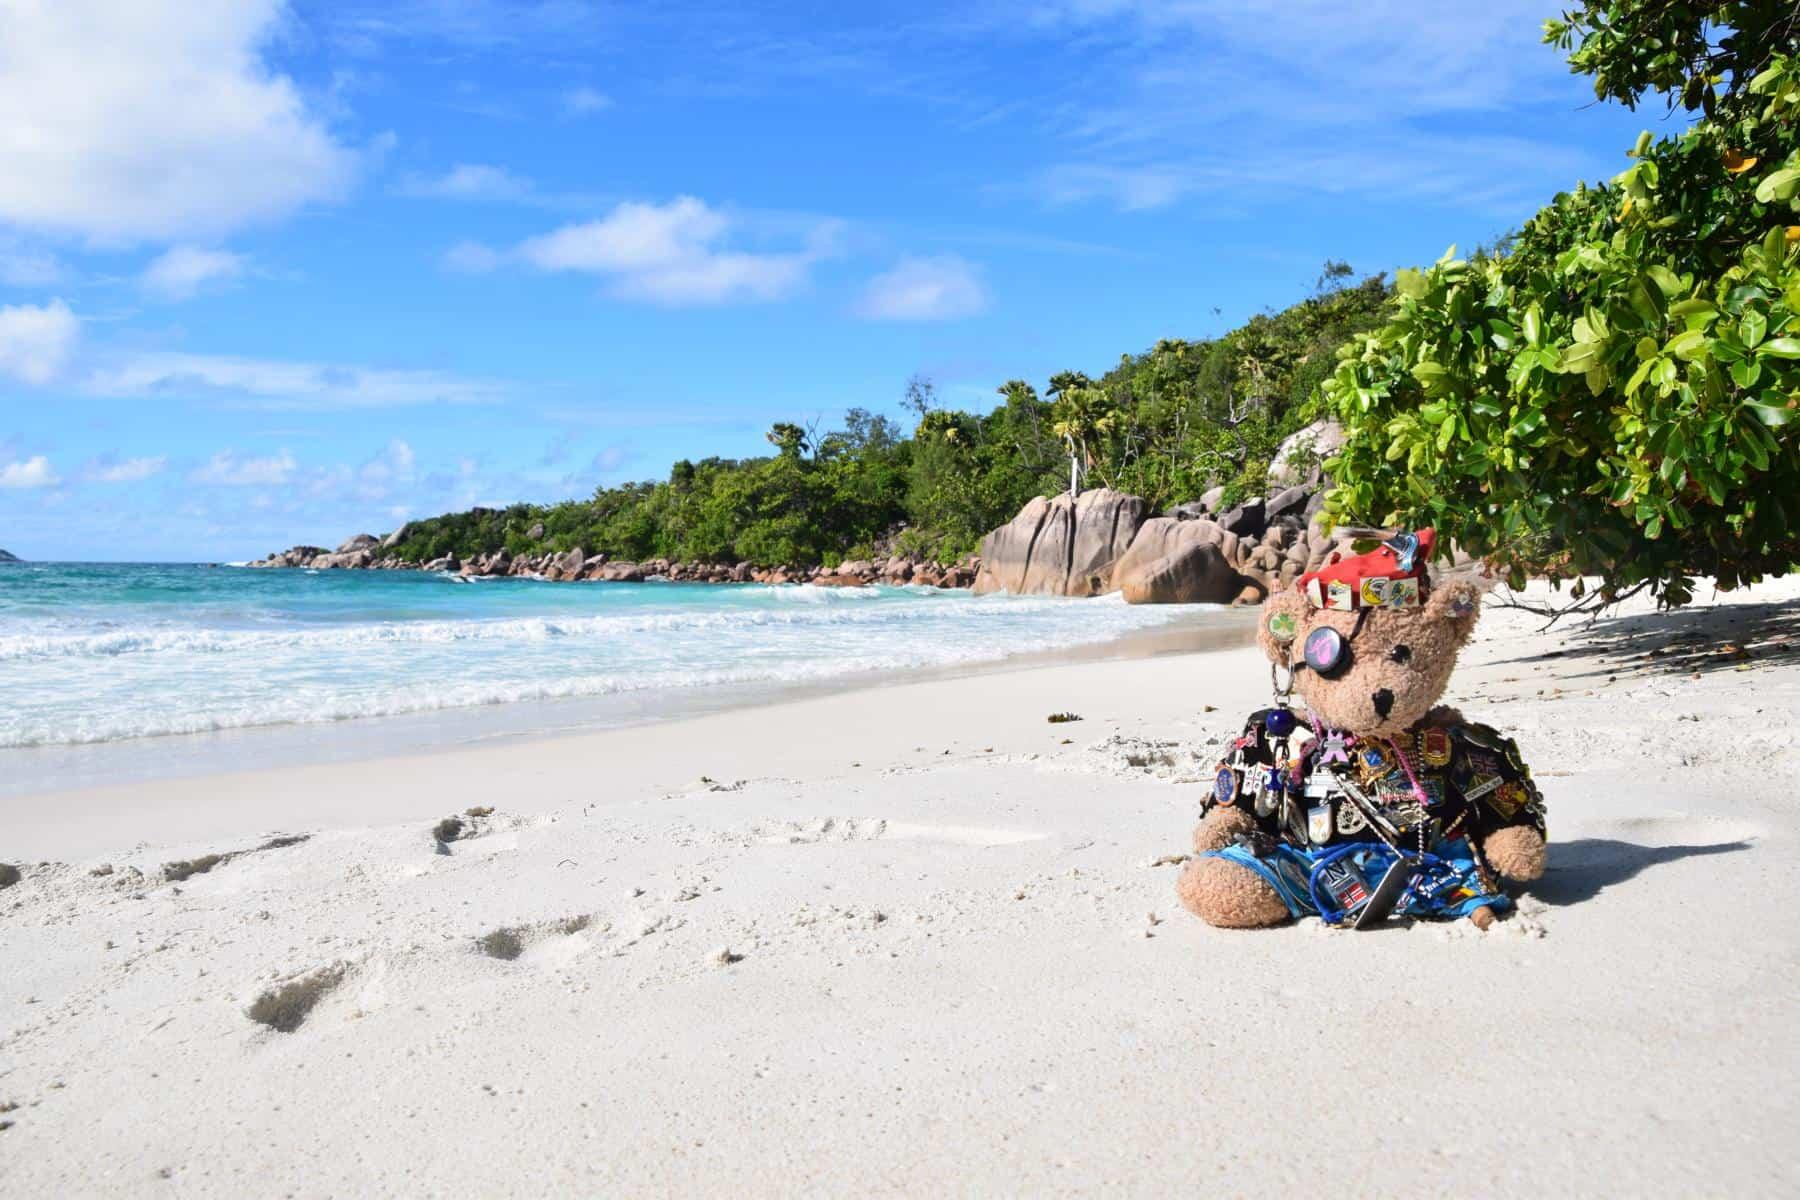 00 jack bearow reiseblog fernwehblog traumstrand anse lazio praslin islandhopping seychellen